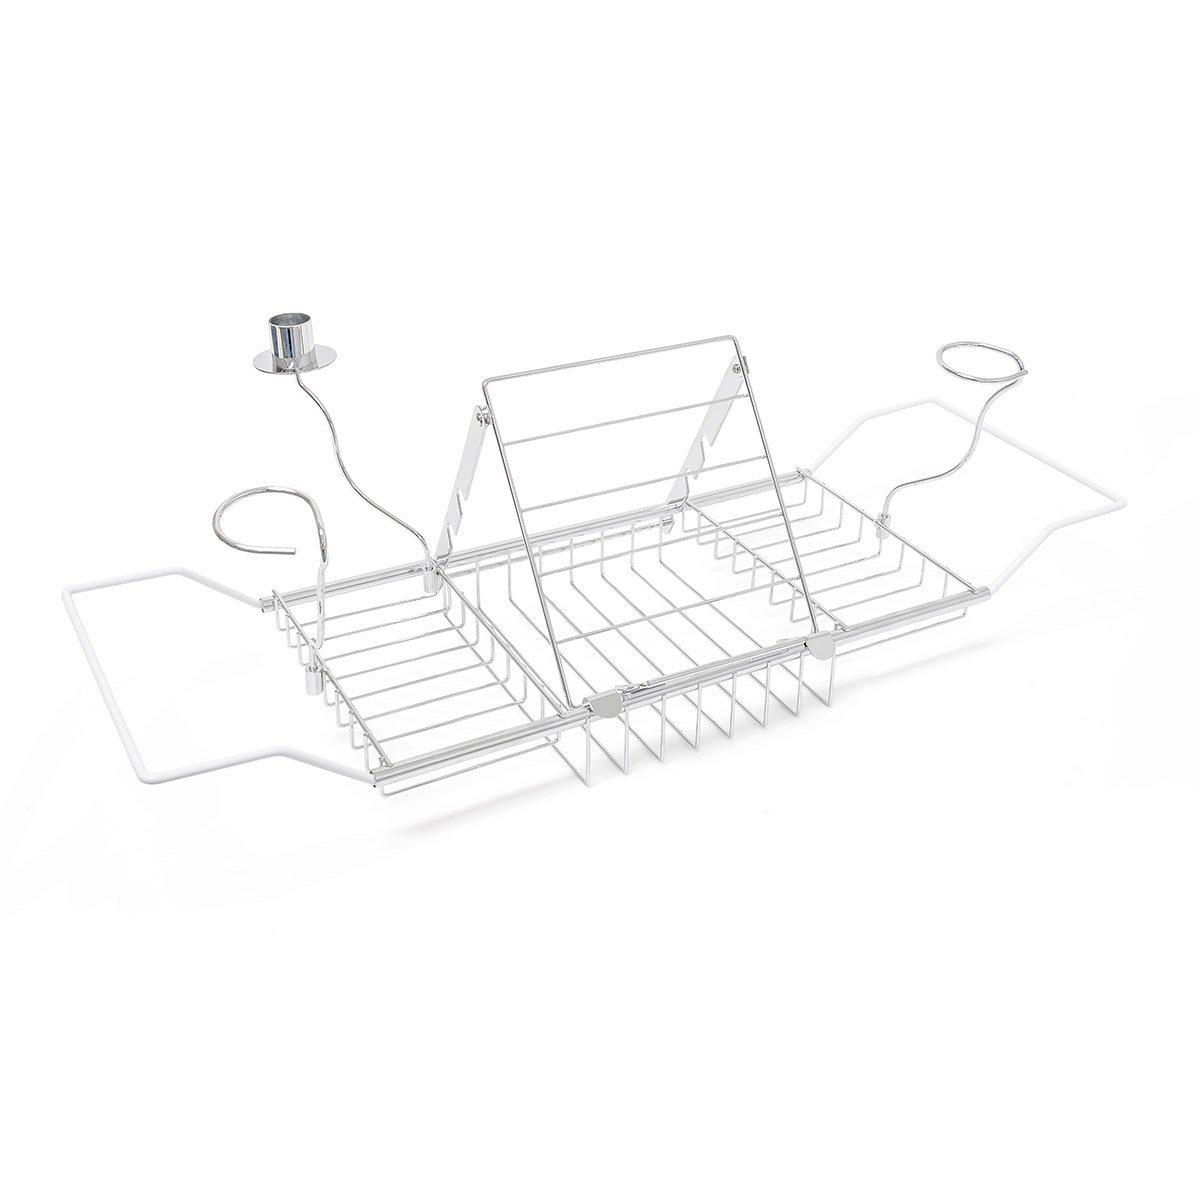 Bandeja de baño Metal–Extensible 62–90cm––Mampara–Repisa–Bañera bañera quantio